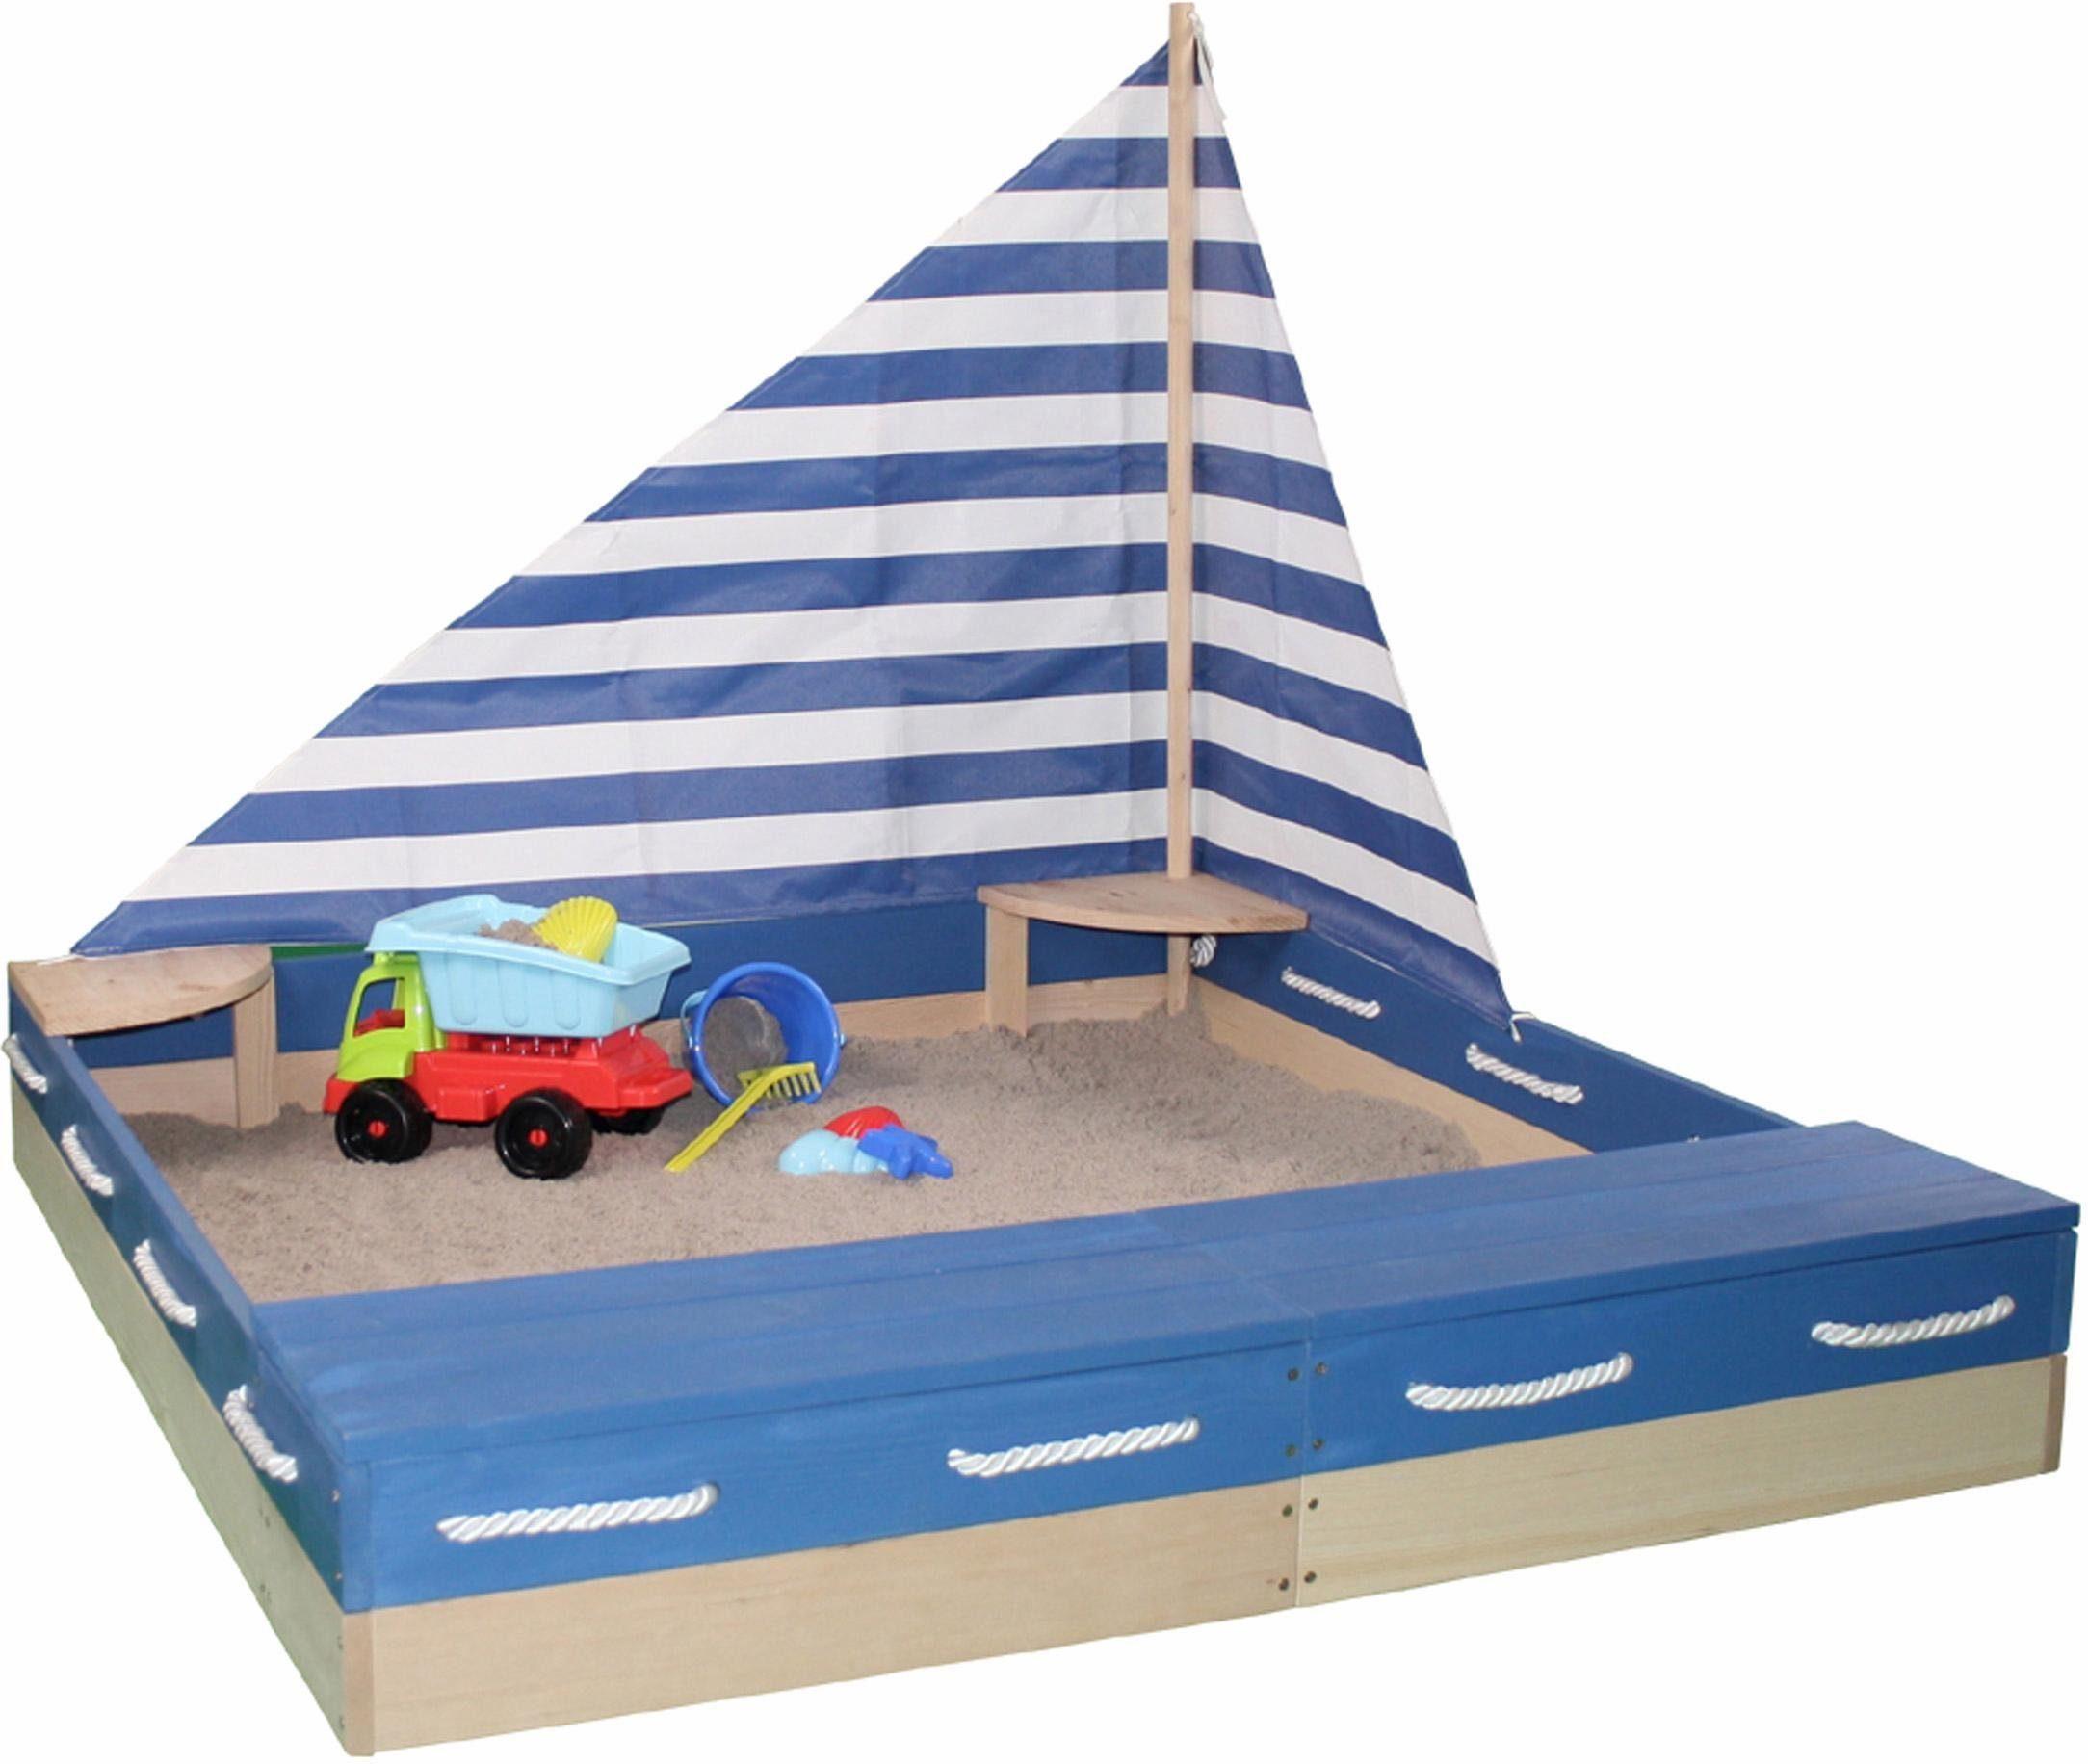 Sun Sandkasten aus Holz, »Matrose«